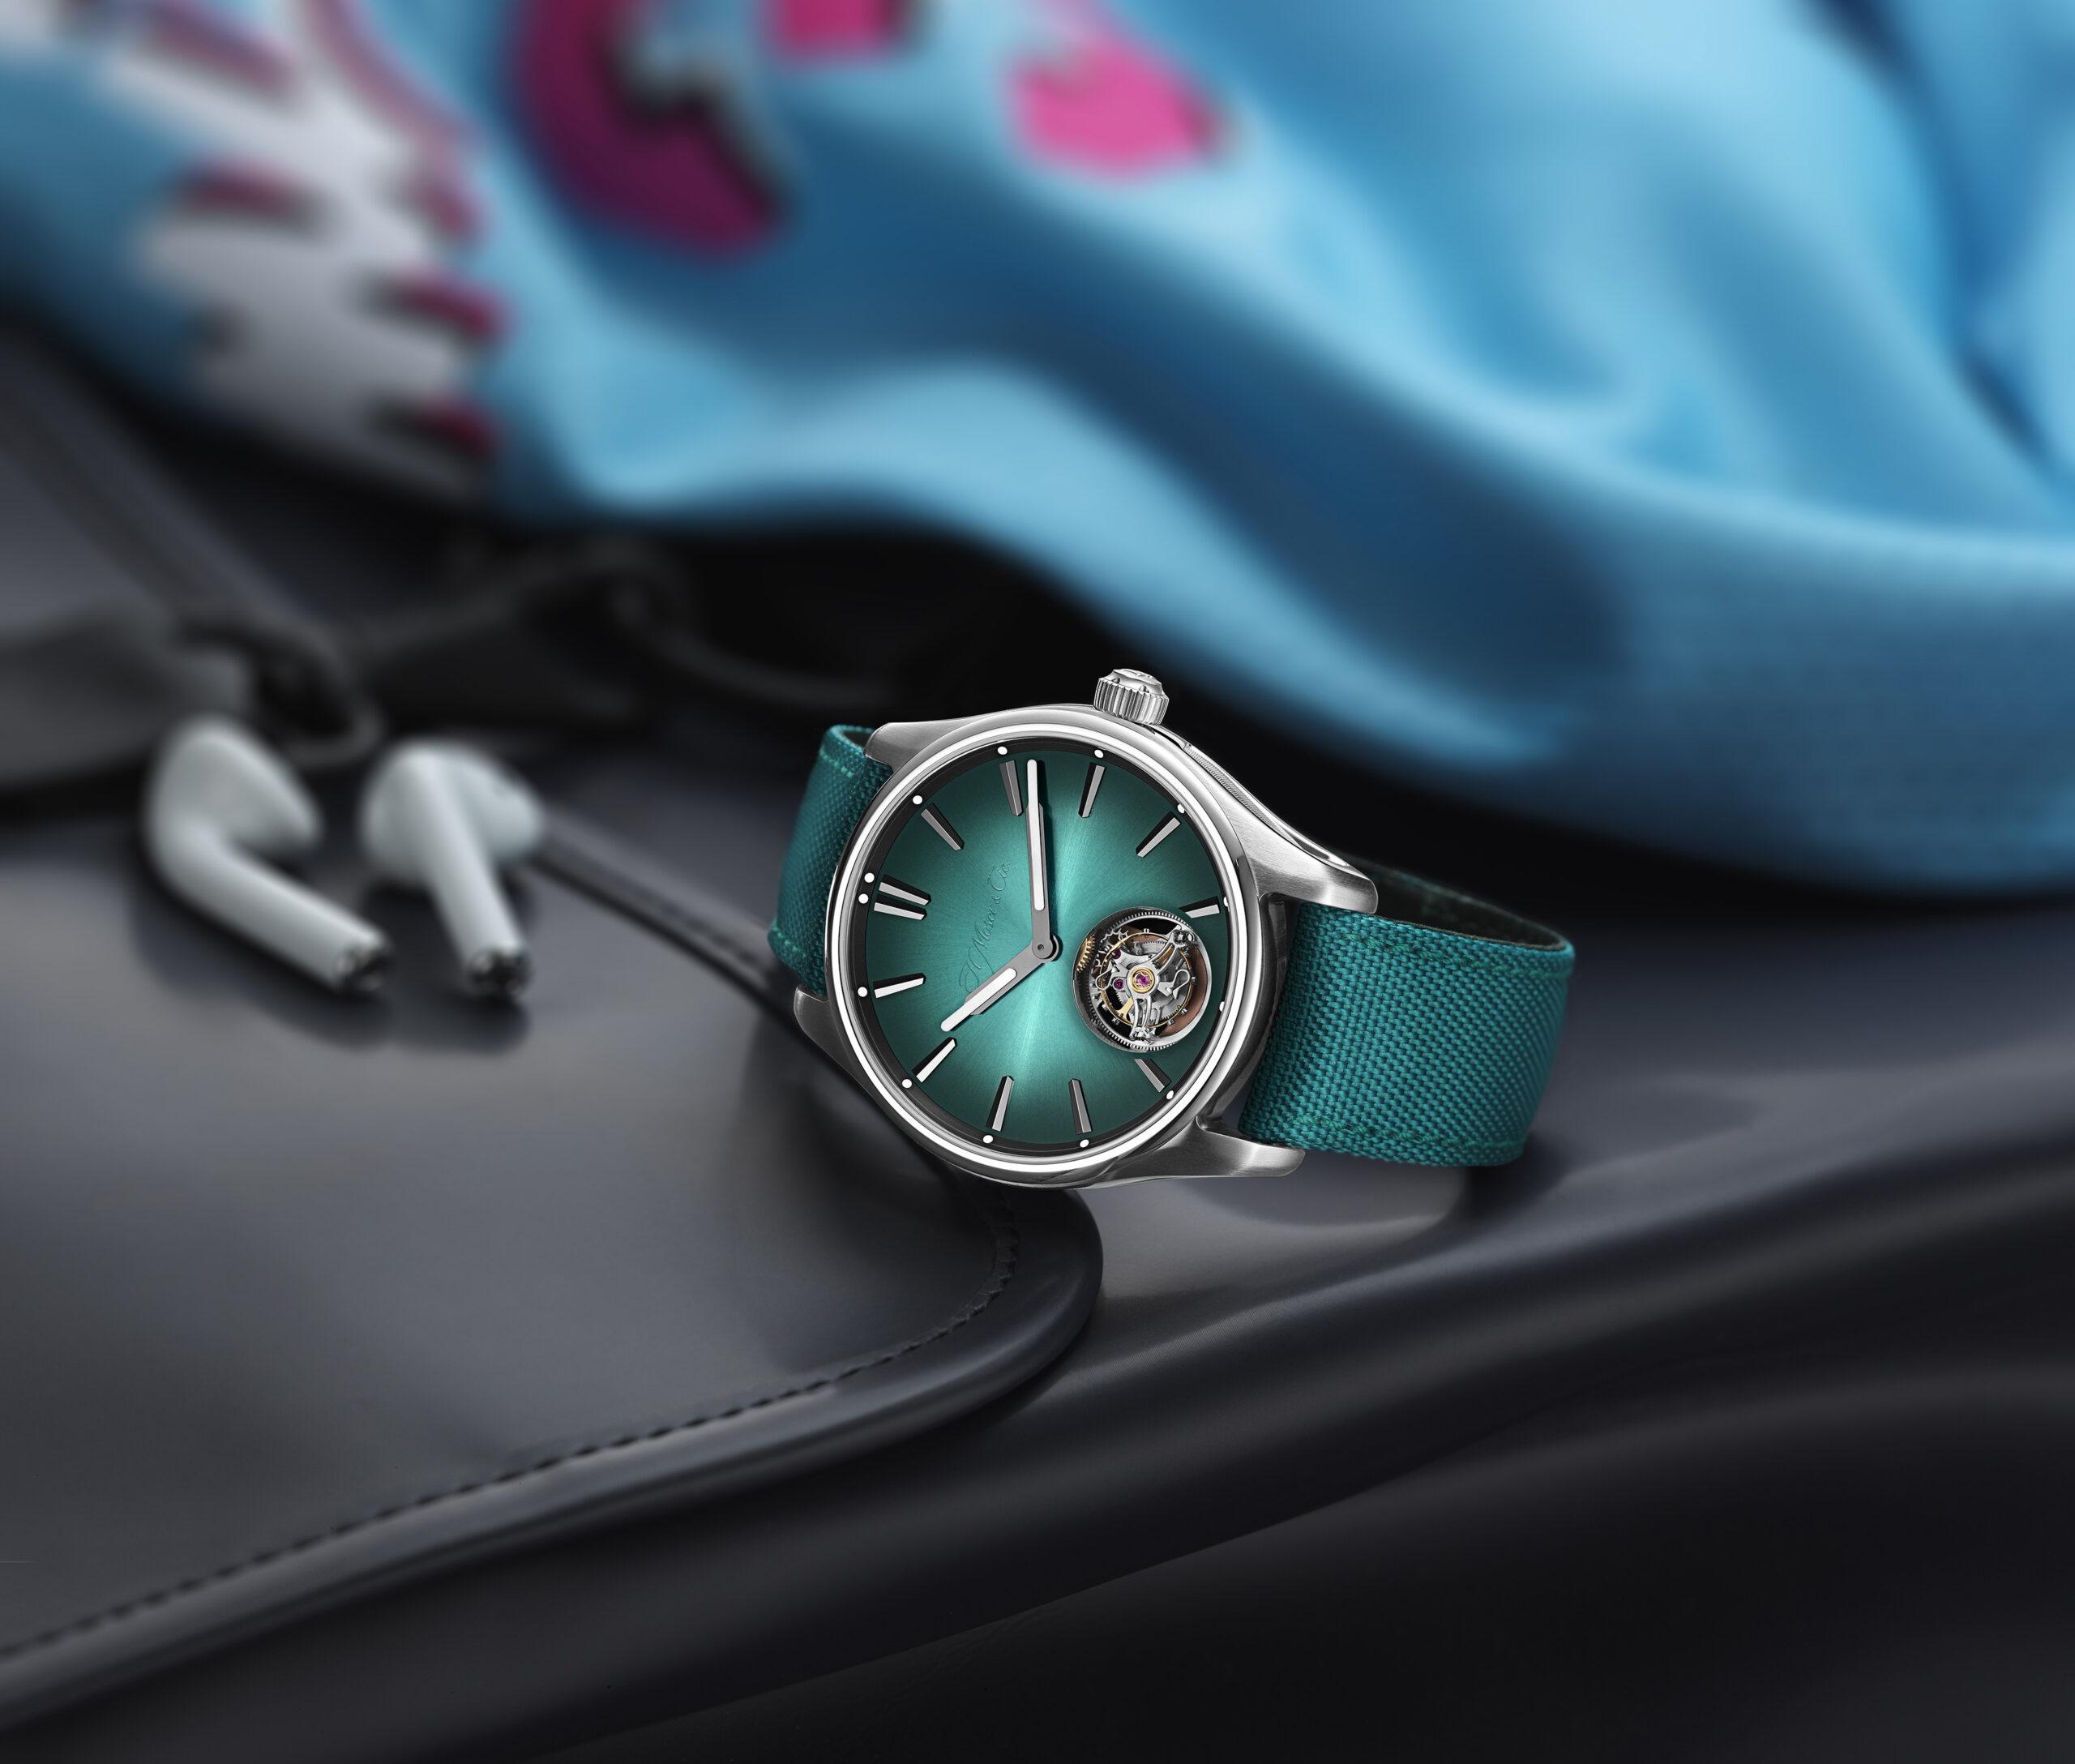 Debbiehathway-the-watch-to-wear-with-boardshorts-or-tux.jpg